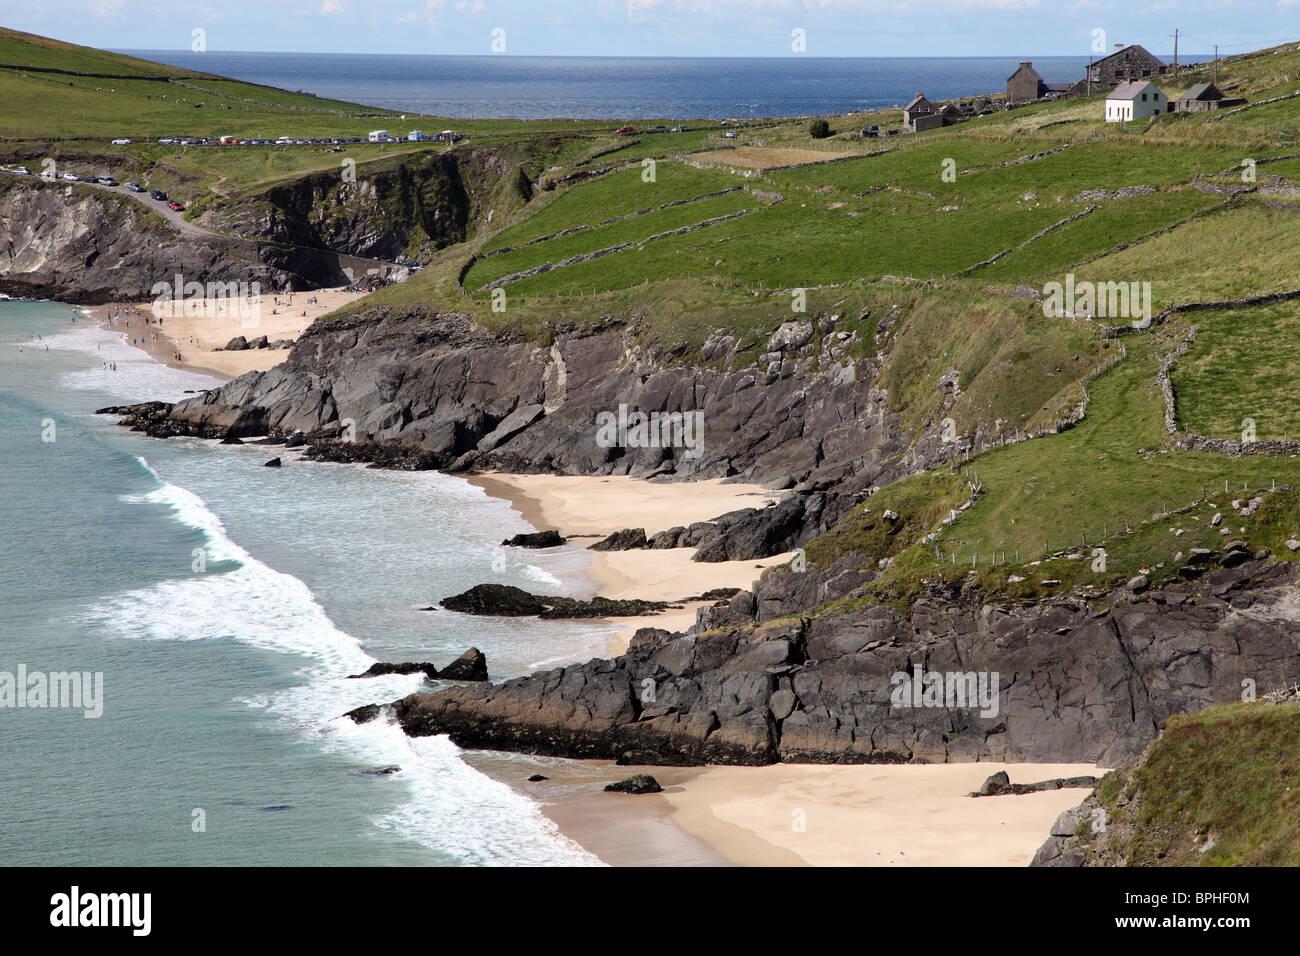 Ryans Daughter beach, Slea Head, Dingle Peninsula - Stock Image